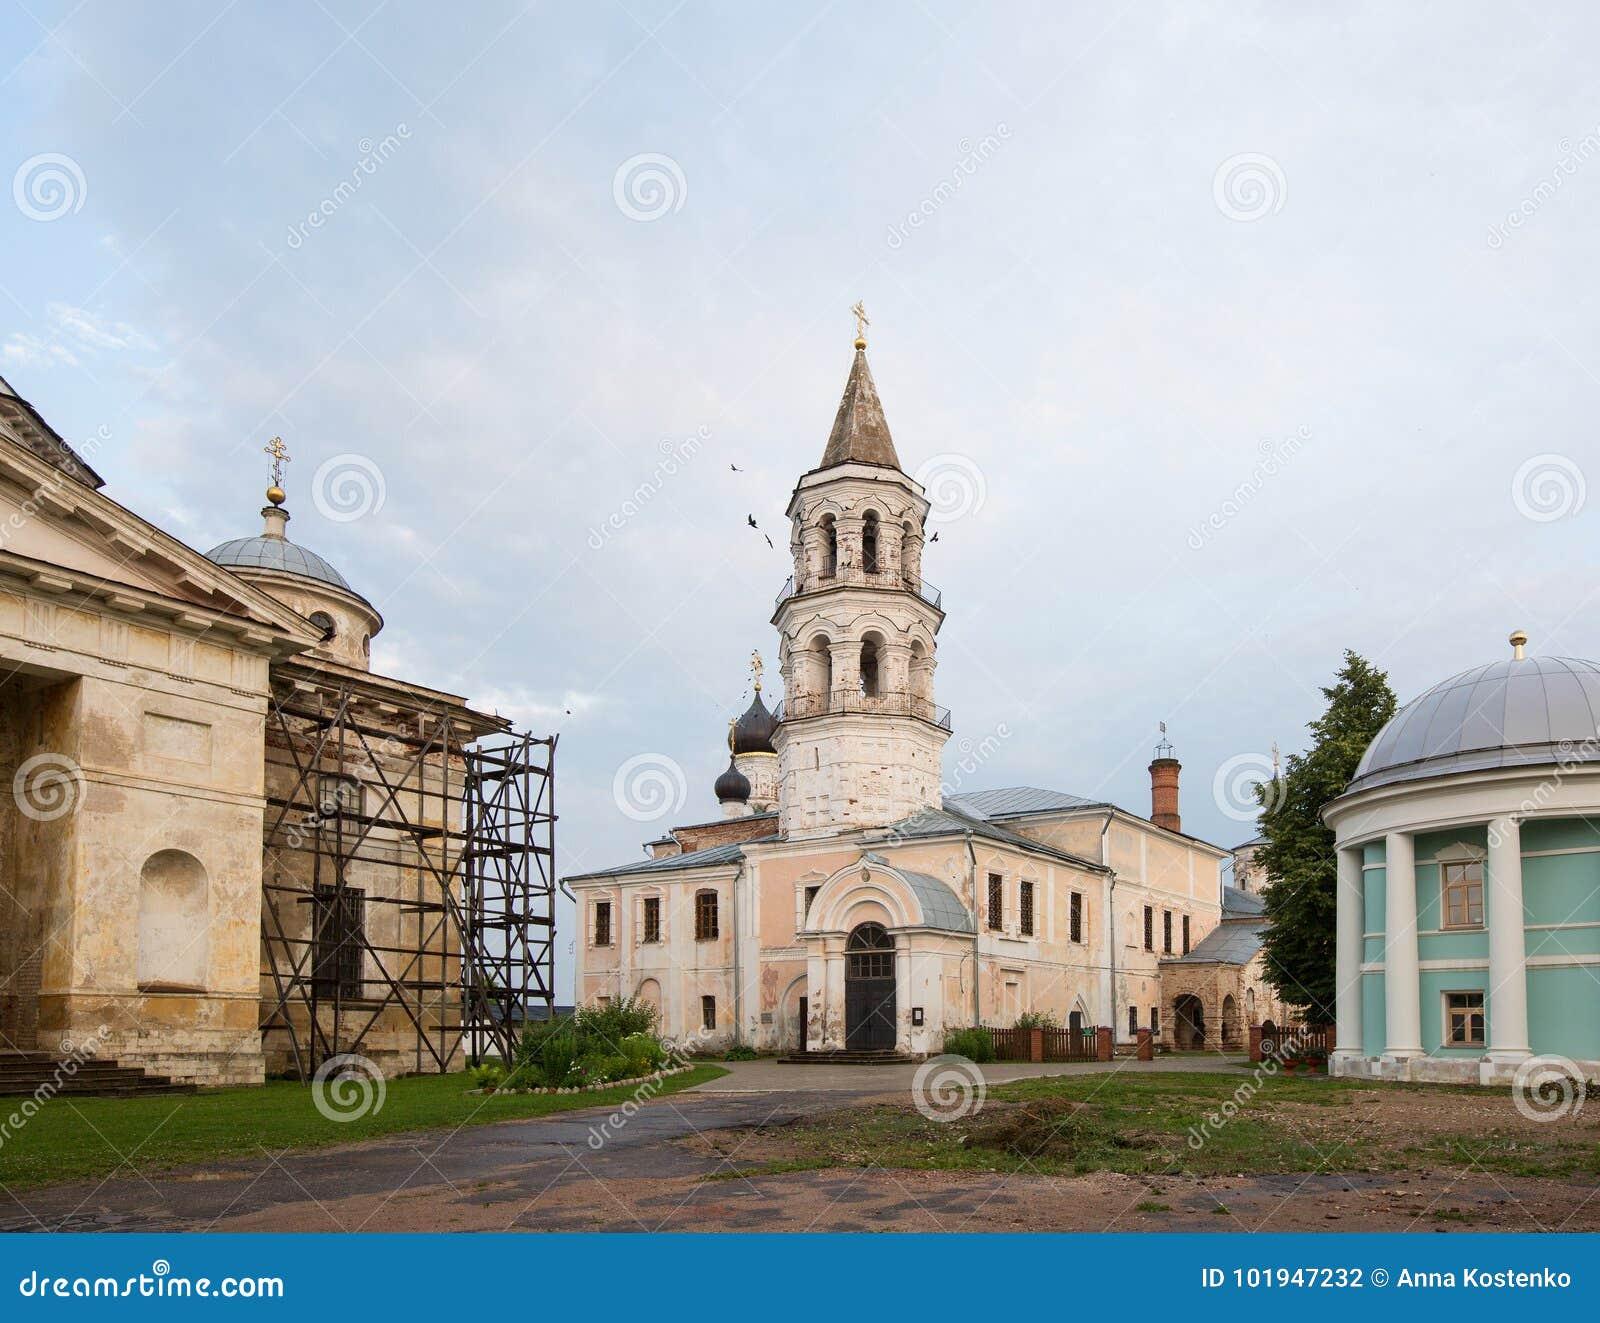 Borisoglebsky Monastery in Dmitrov. History, description, interesting facts 44